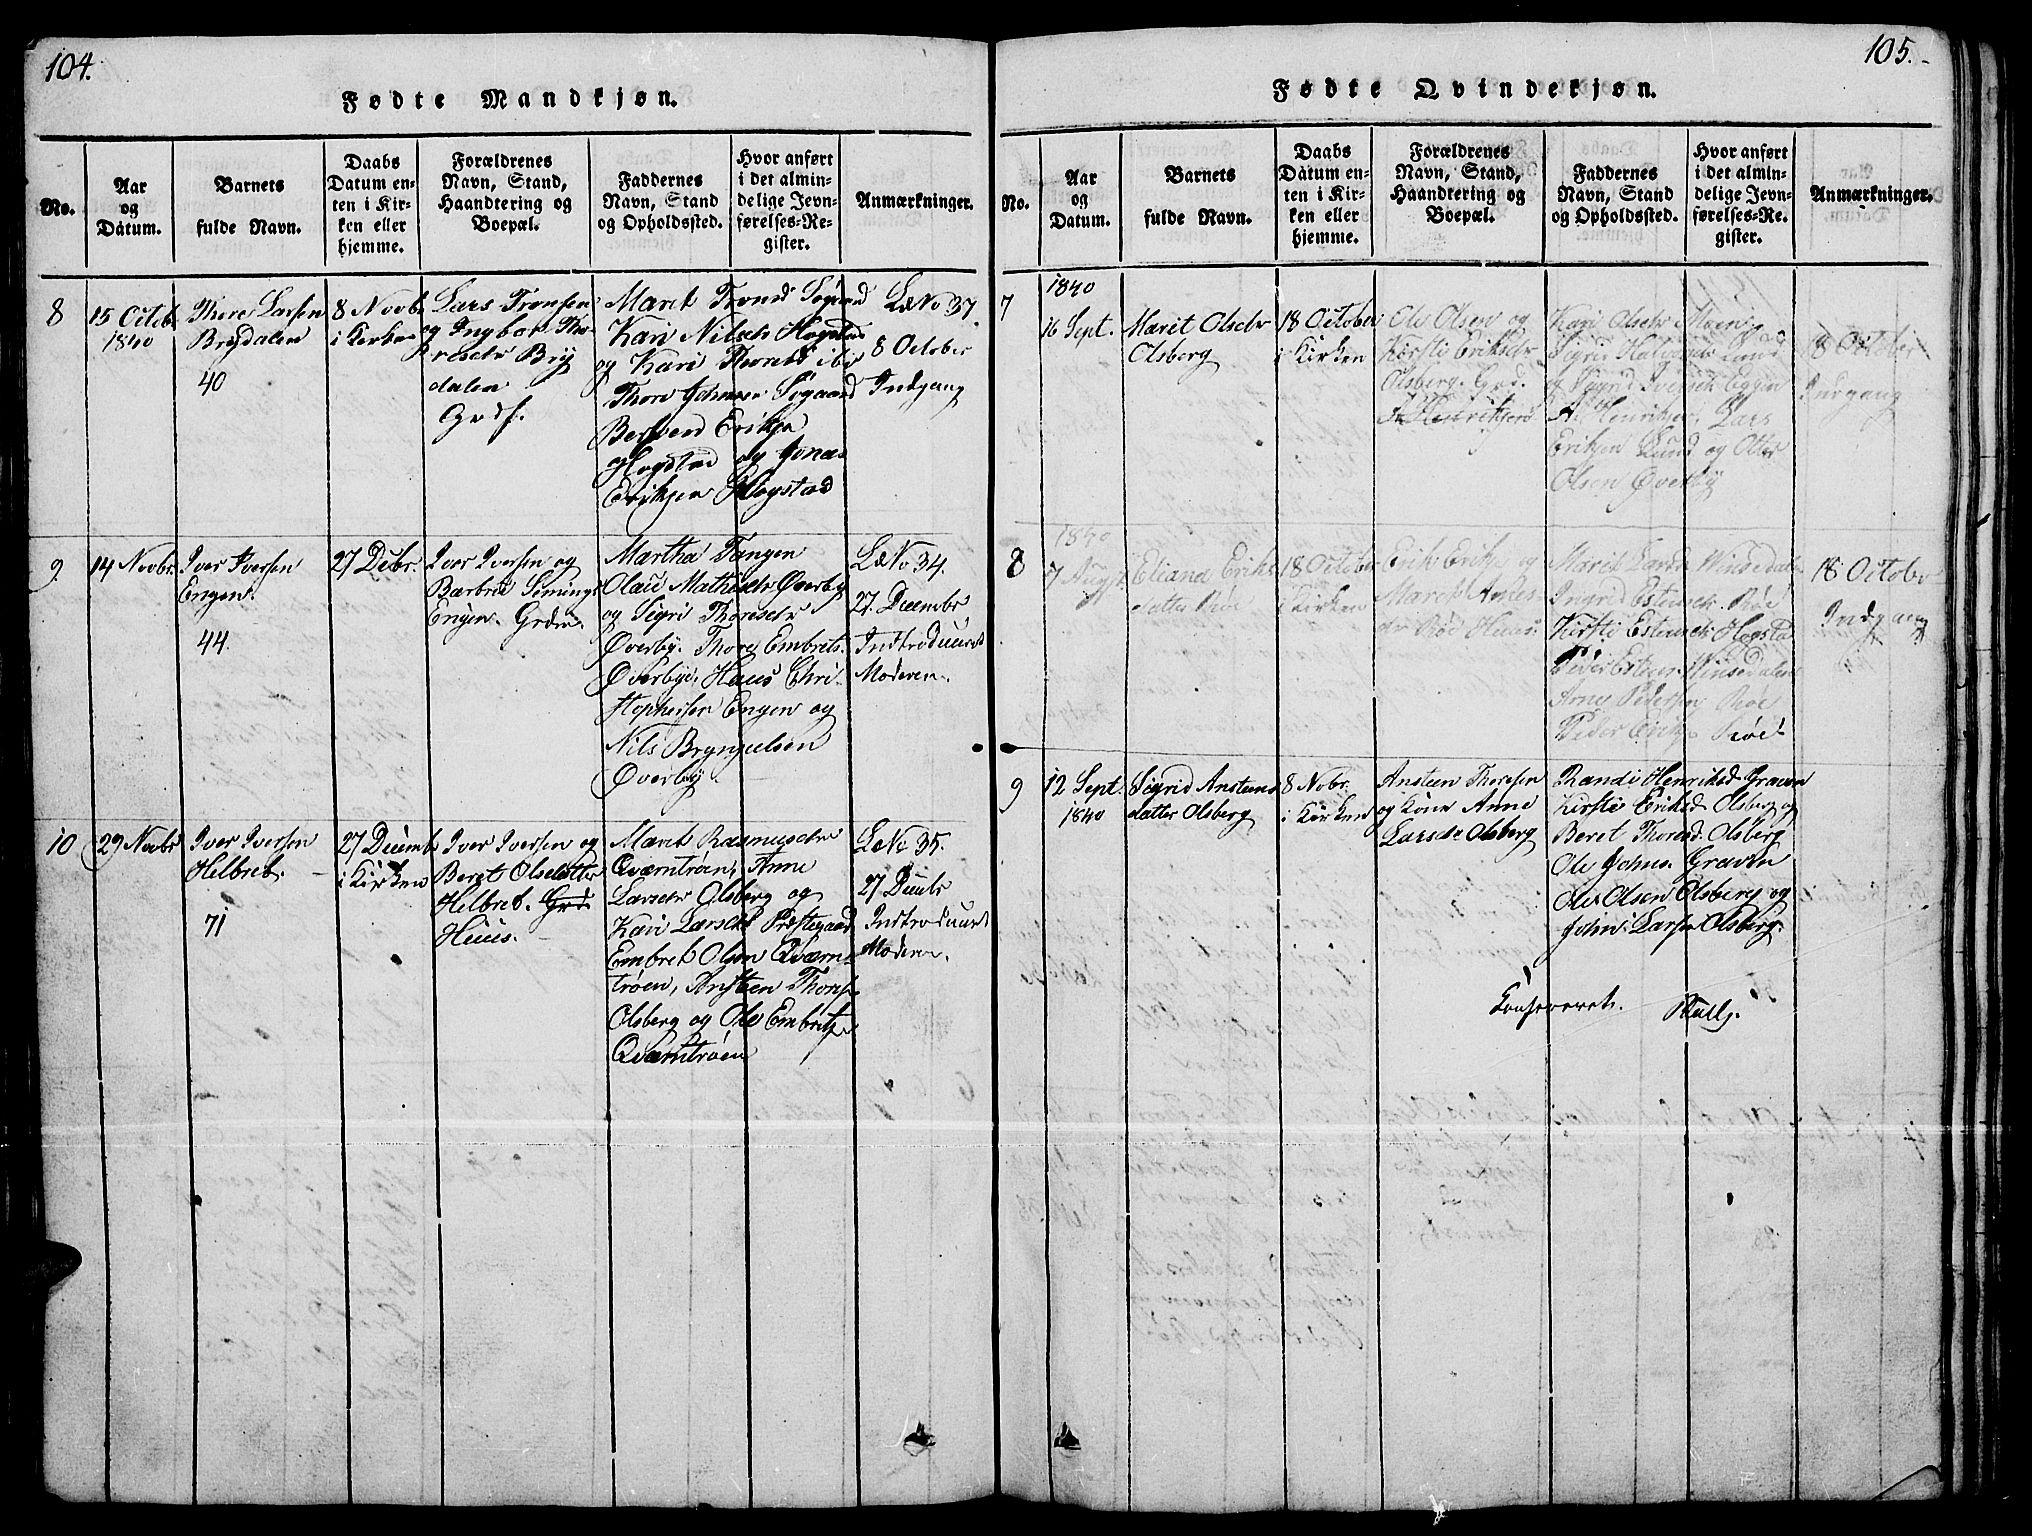 SAH, Tynset prestekontor, Klokkerbok nr. 4, 1814-1879, s. 104-105